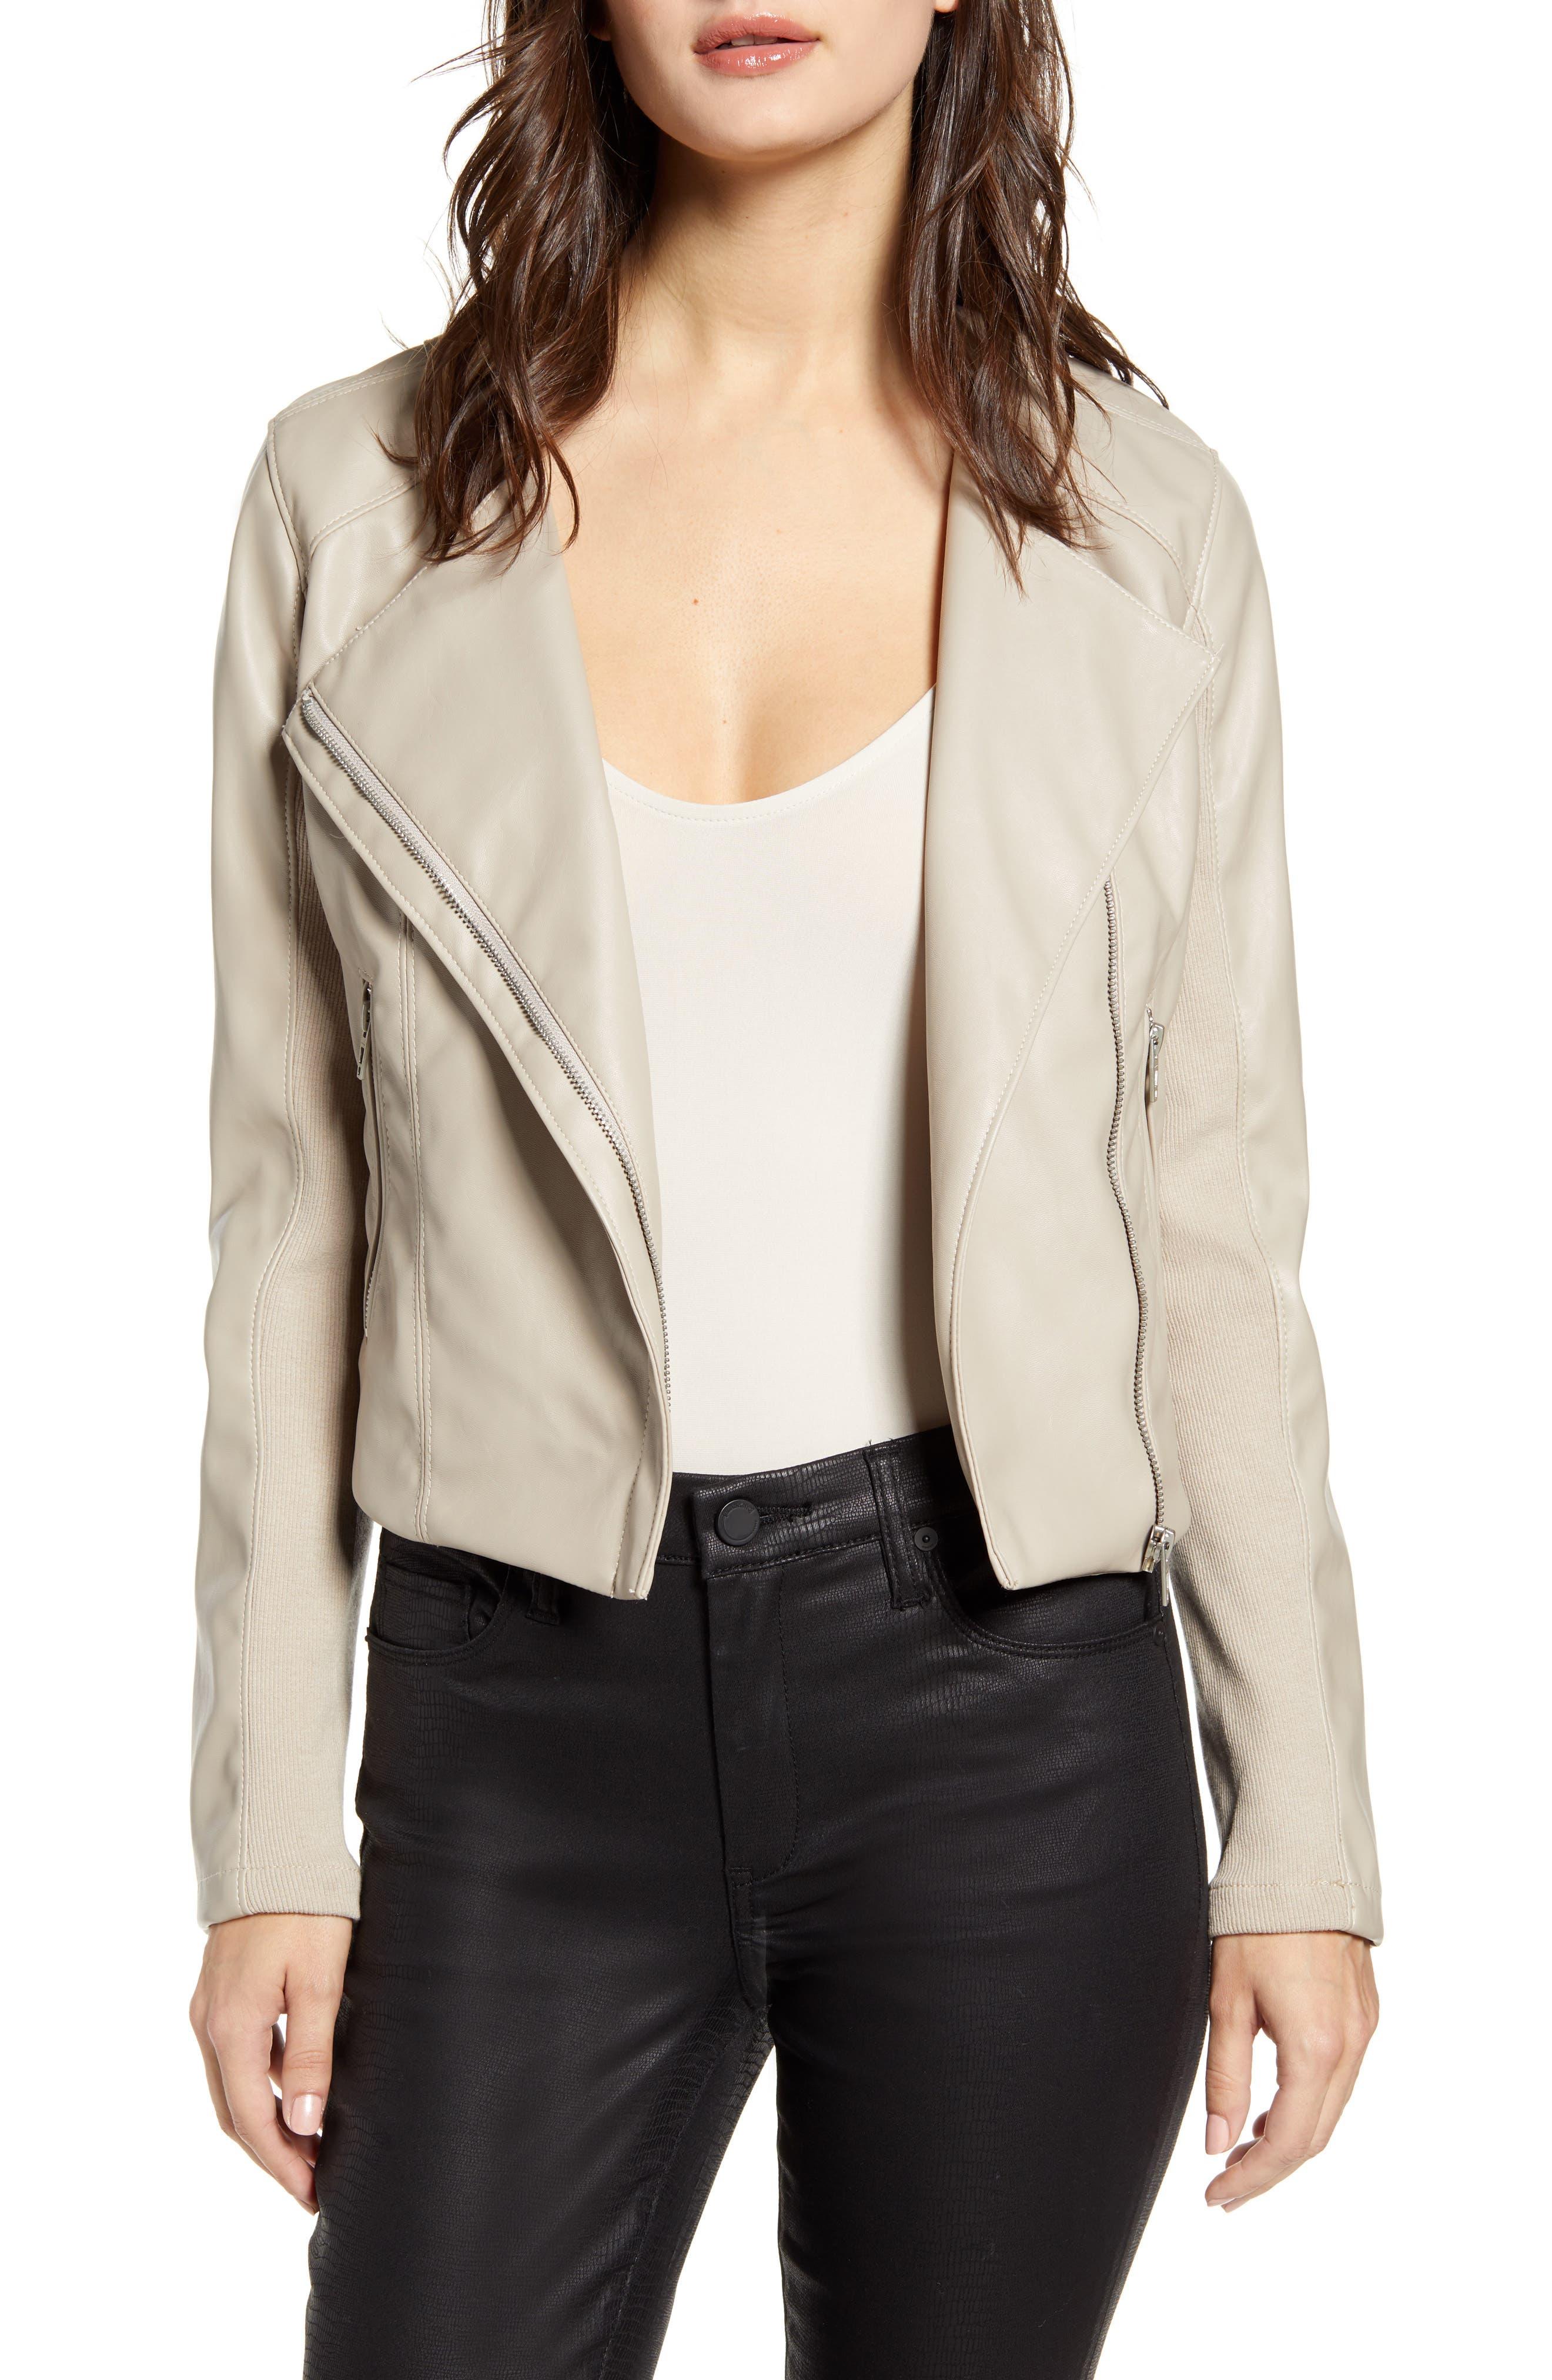 BLANKNYC Record Breaker Collarless Faux Leather Moto Jacket (Regular & Plus Size)